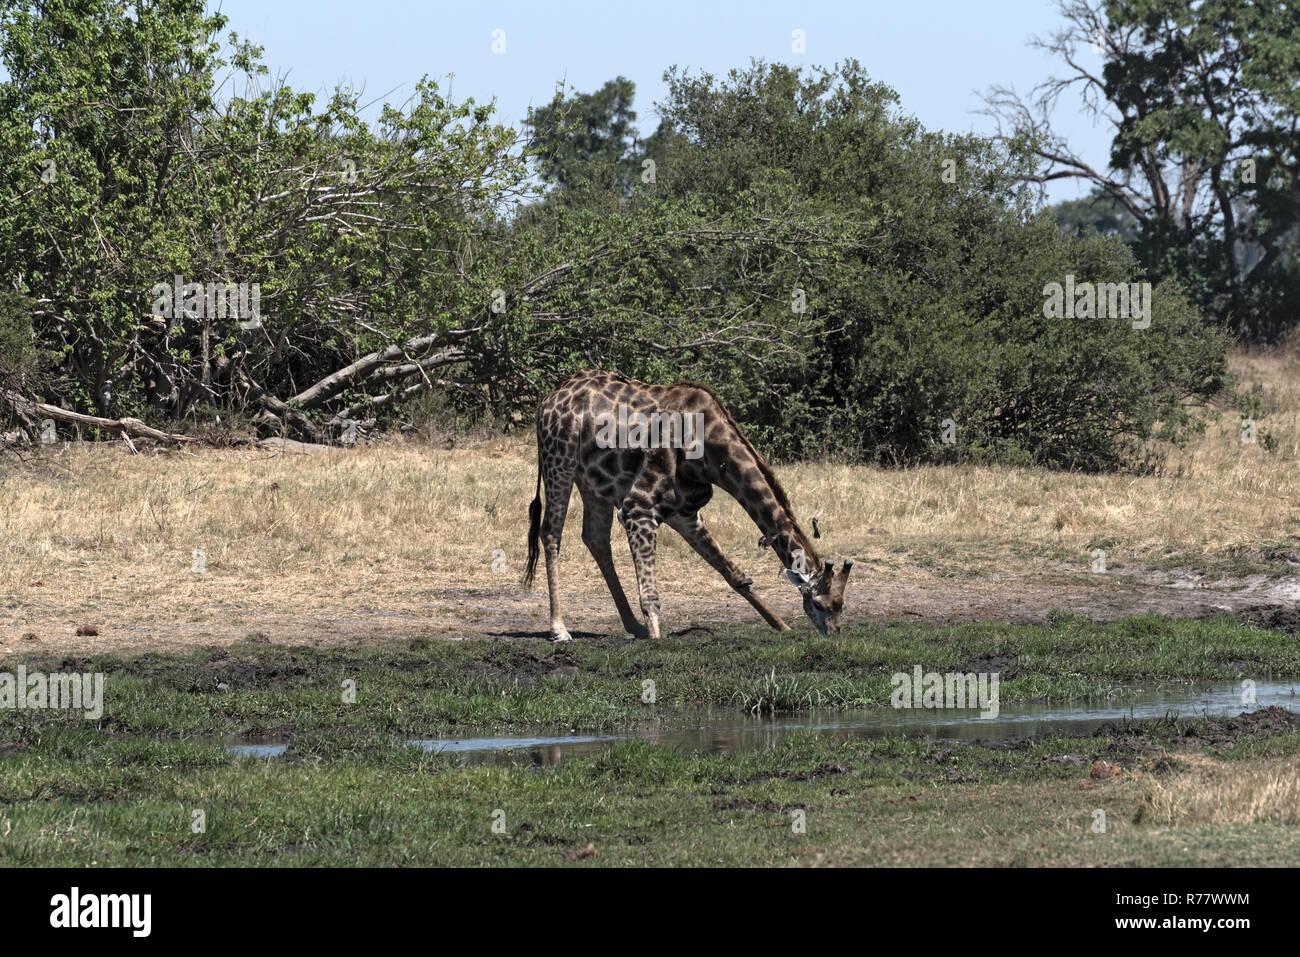 drinking giraffe in the Okavango Delta, Moremi Game Reserve, Botswana - Stock Image